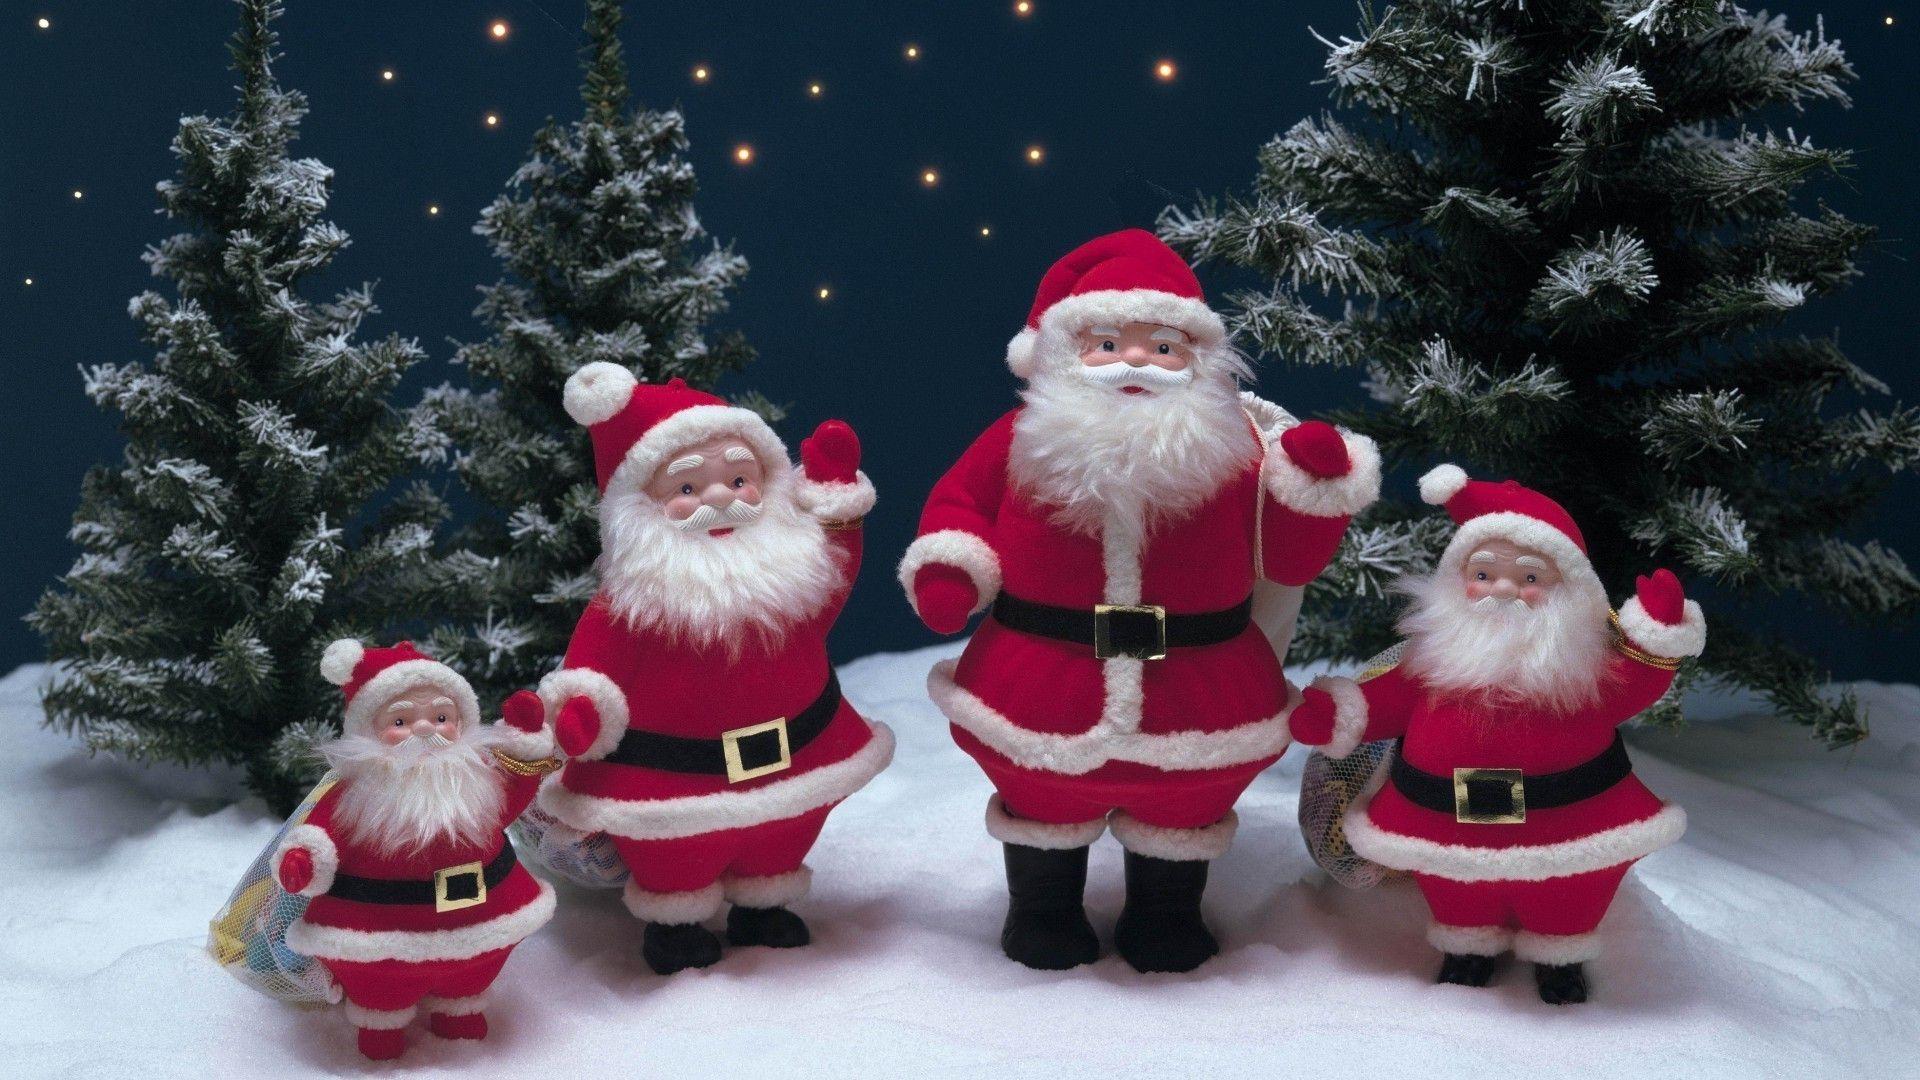 Santa Claus wallpaper image